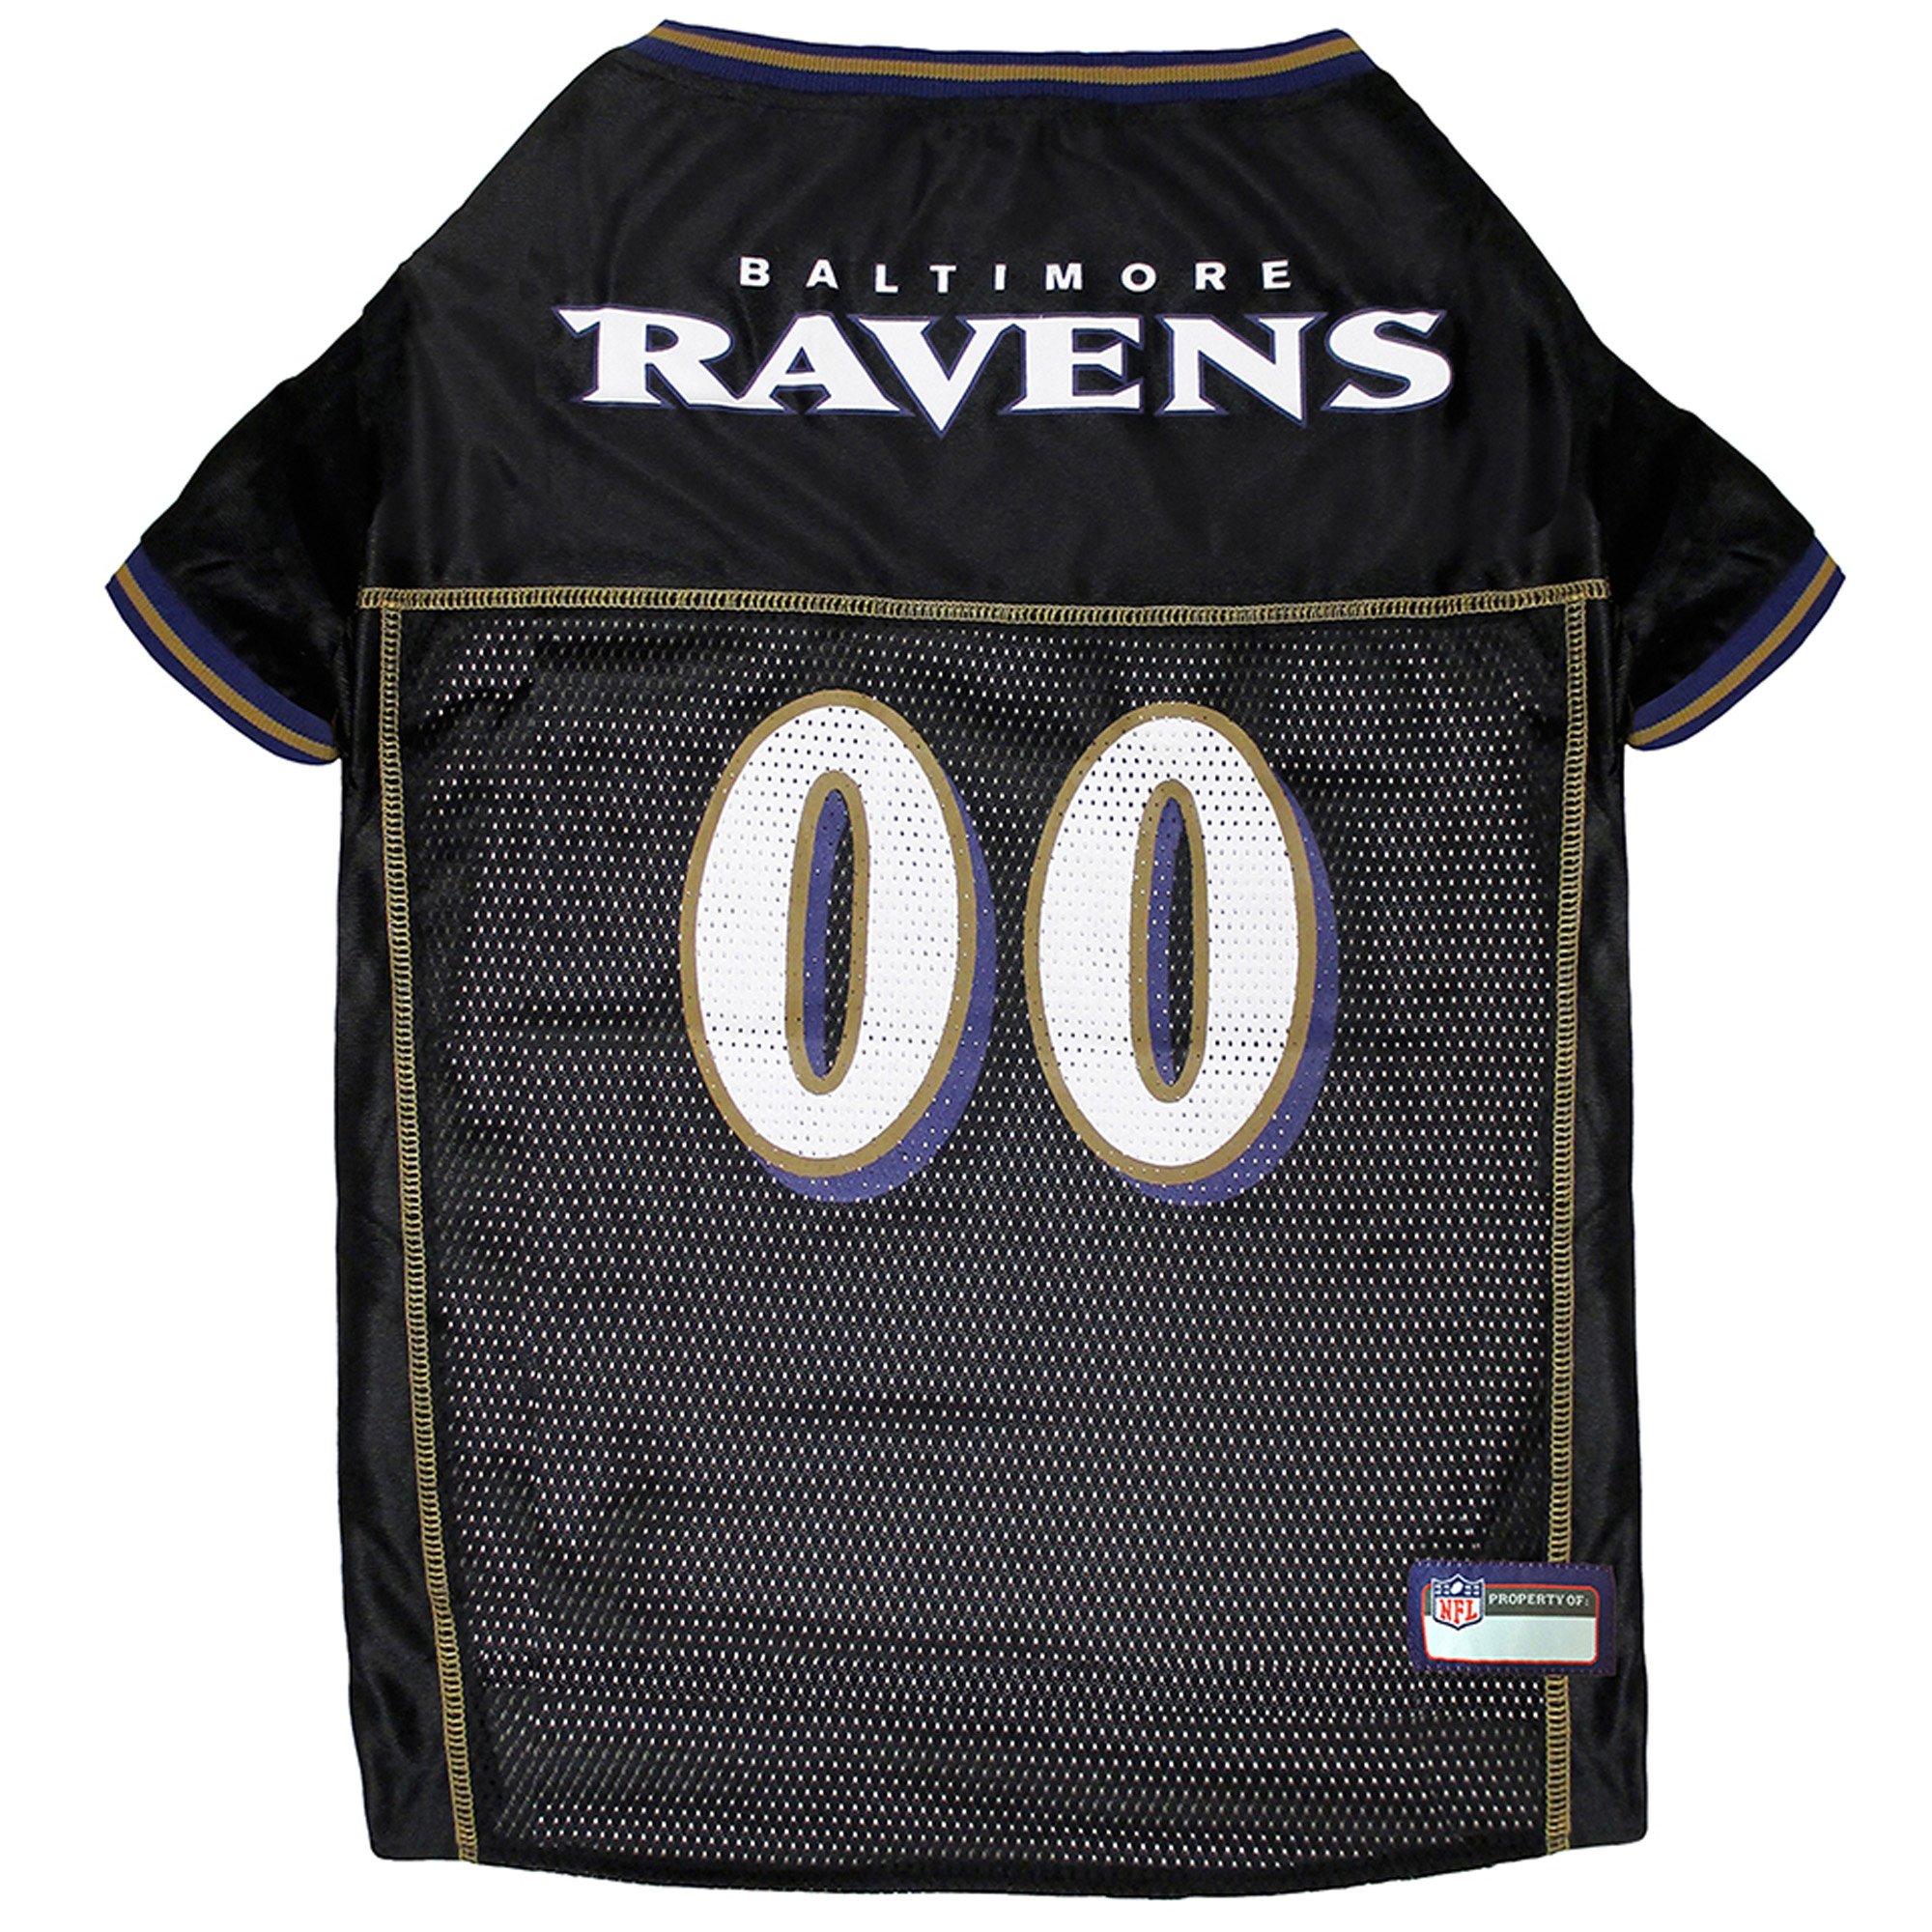 ravens jersey dress